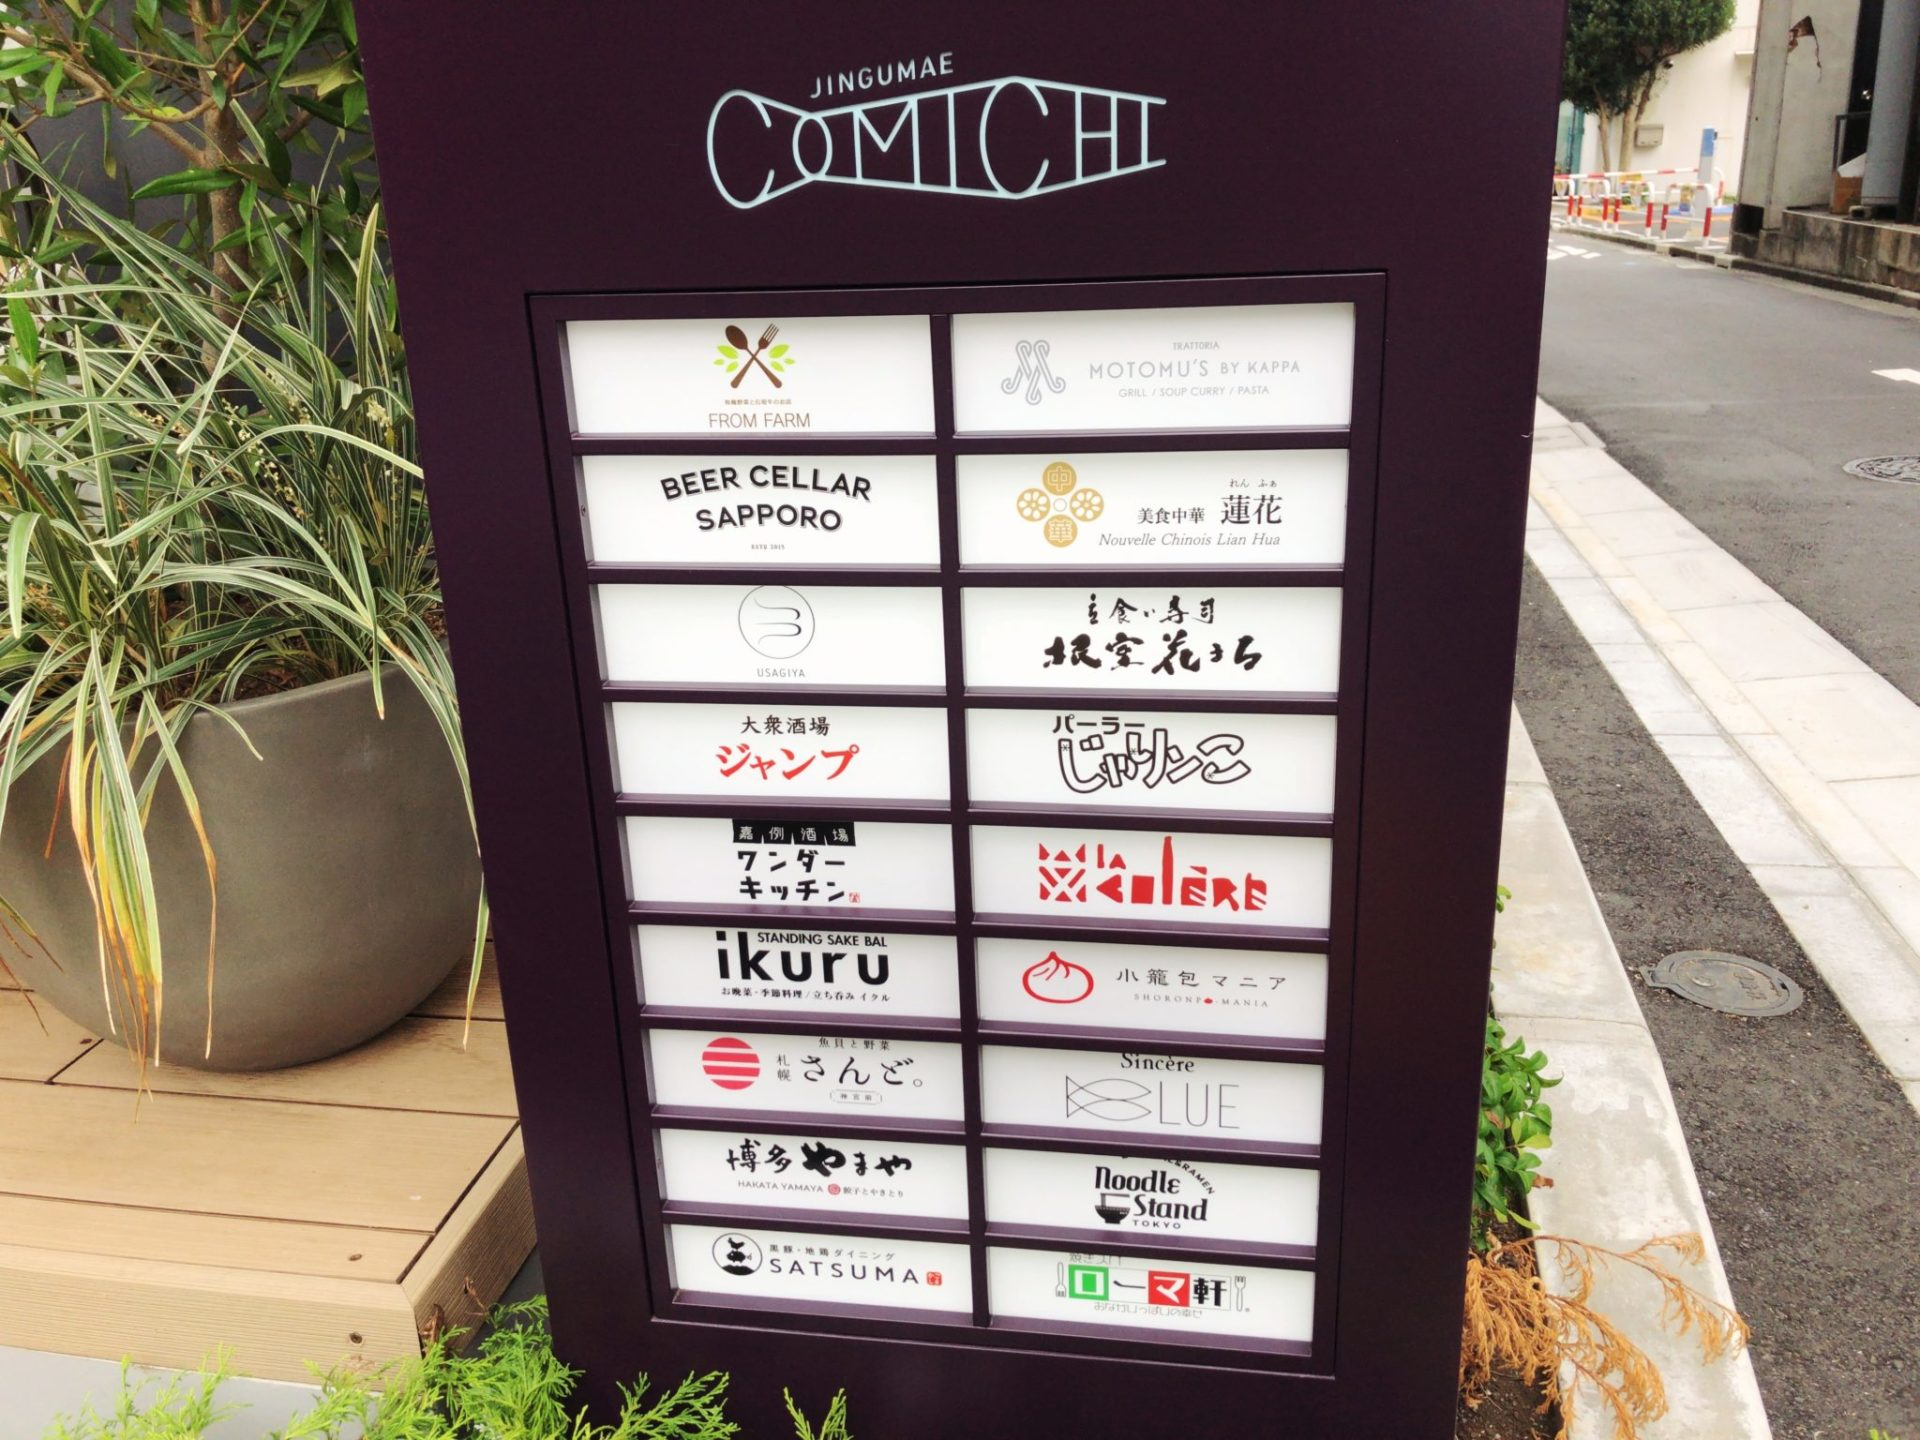 JINGUMAE COMICHI(じんぐうまえこみち)のテナント(全18店舗)